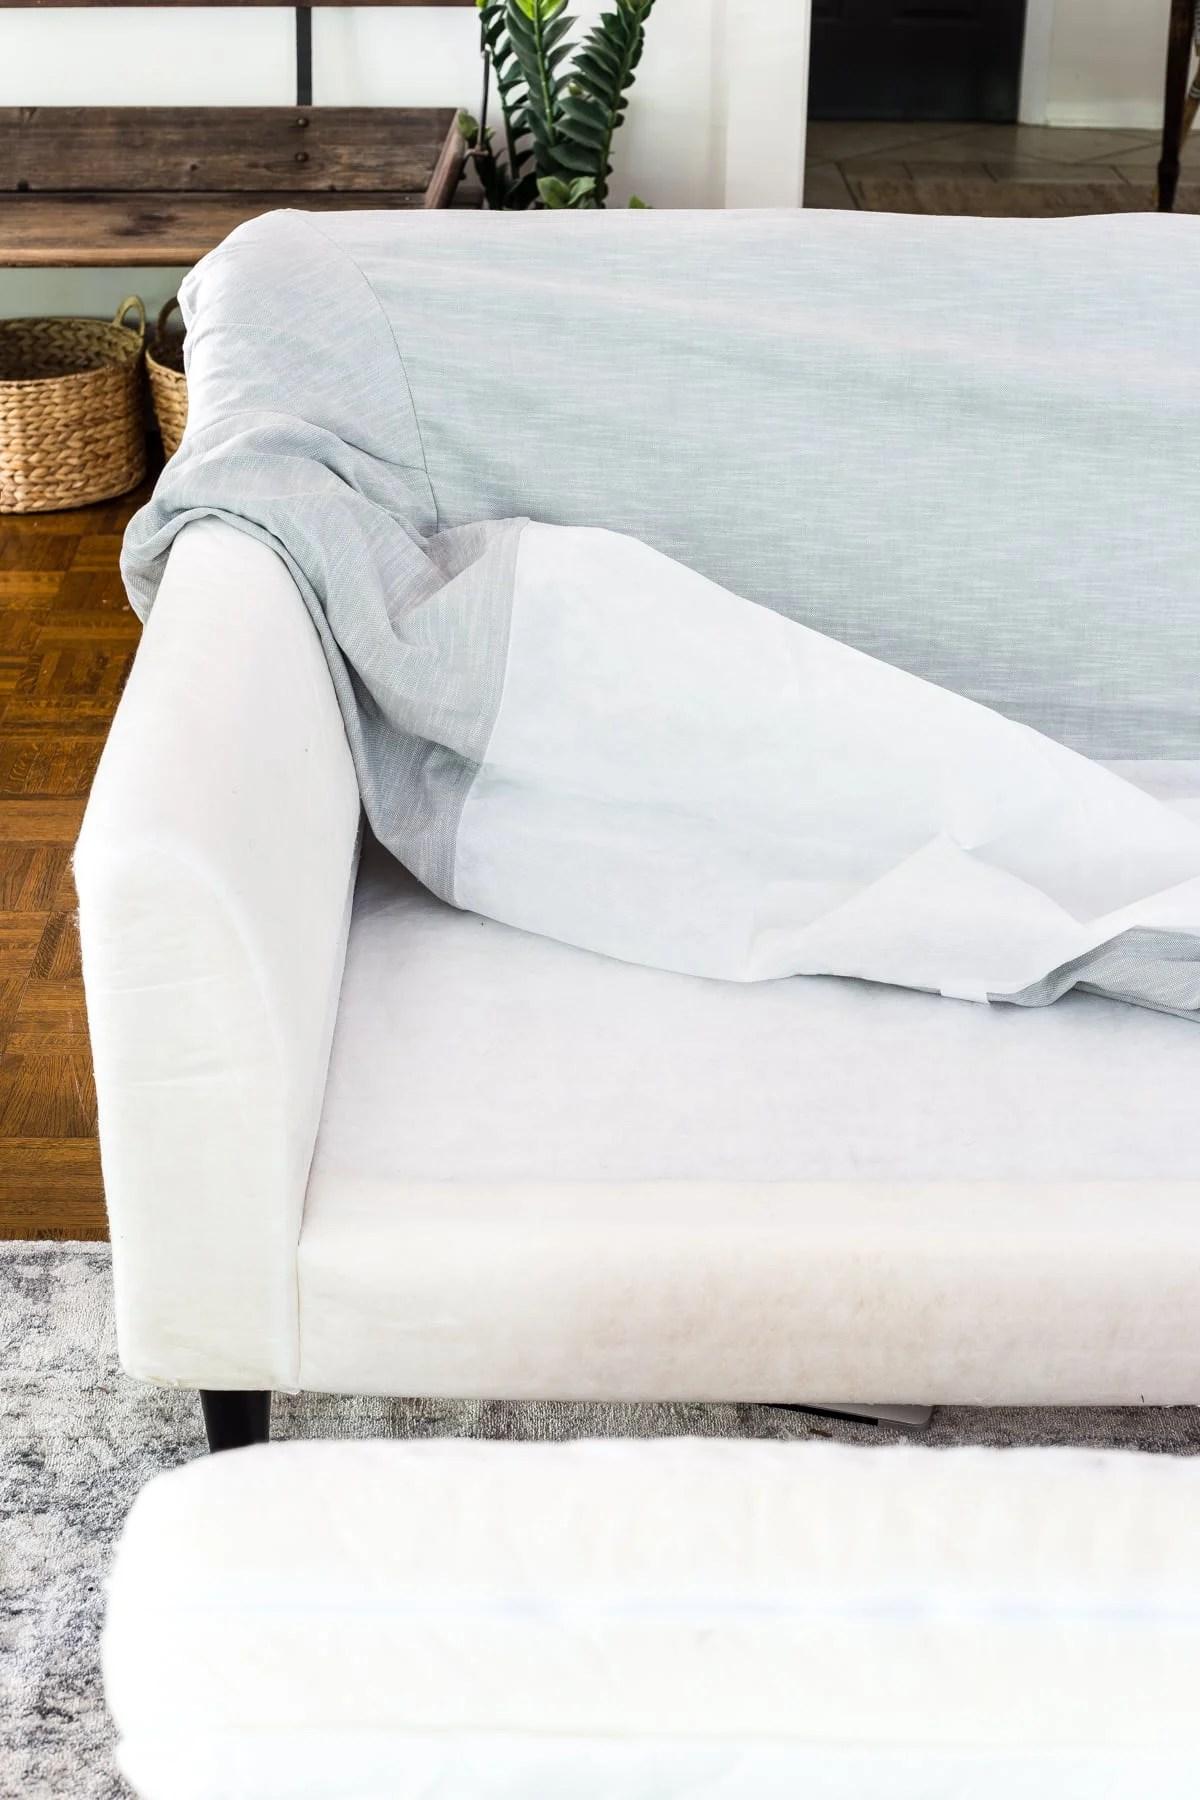 IKEA Farlov sofa and Bemz slipcover